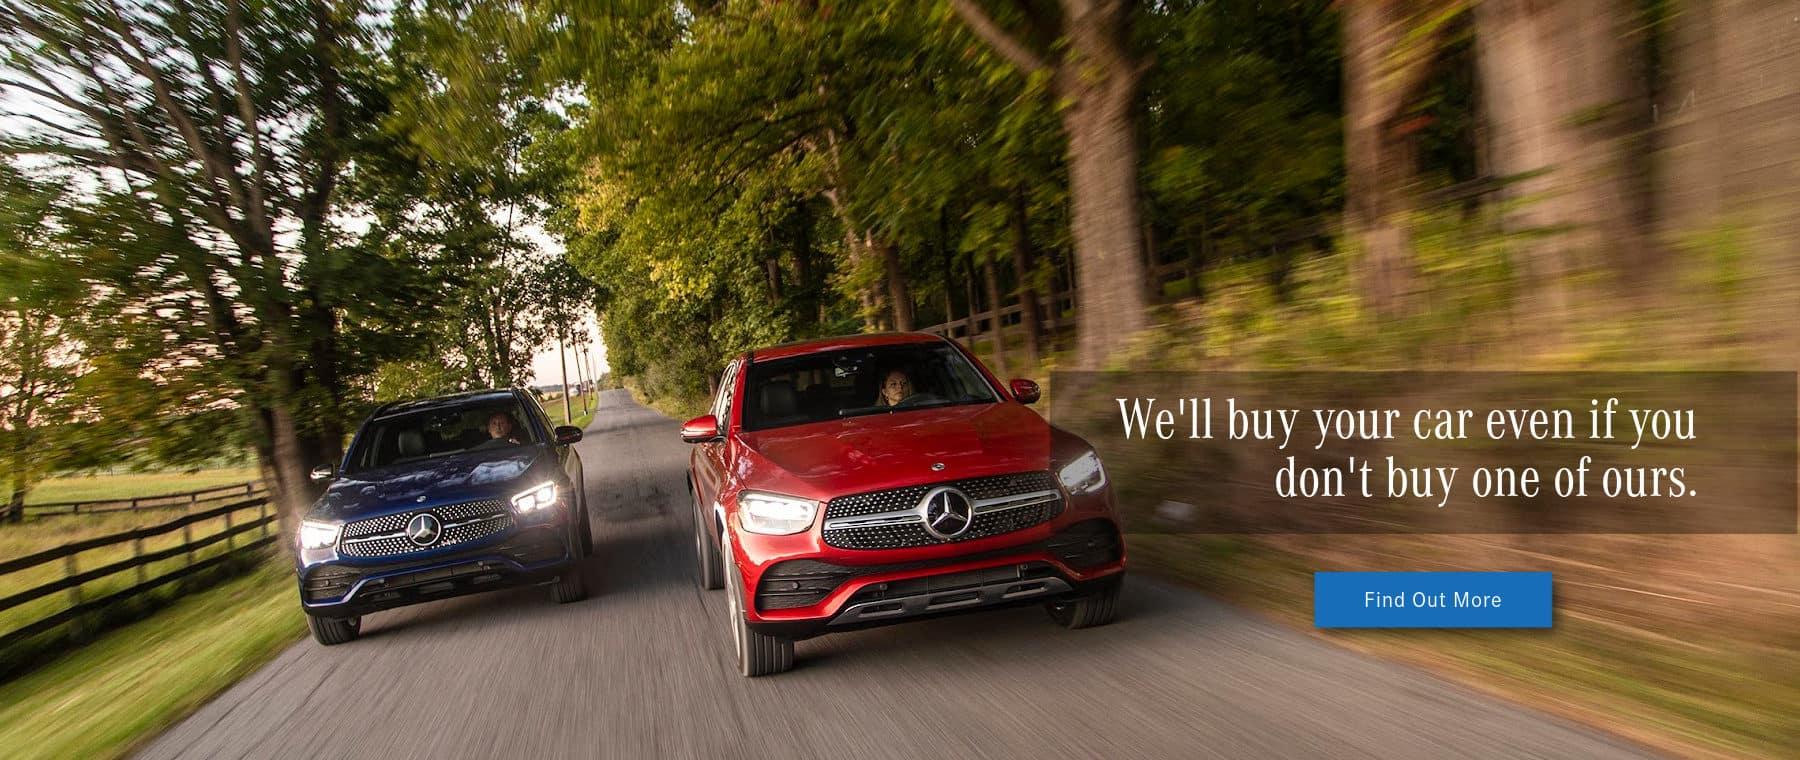 We'll-Buy-Your-Car-rev1